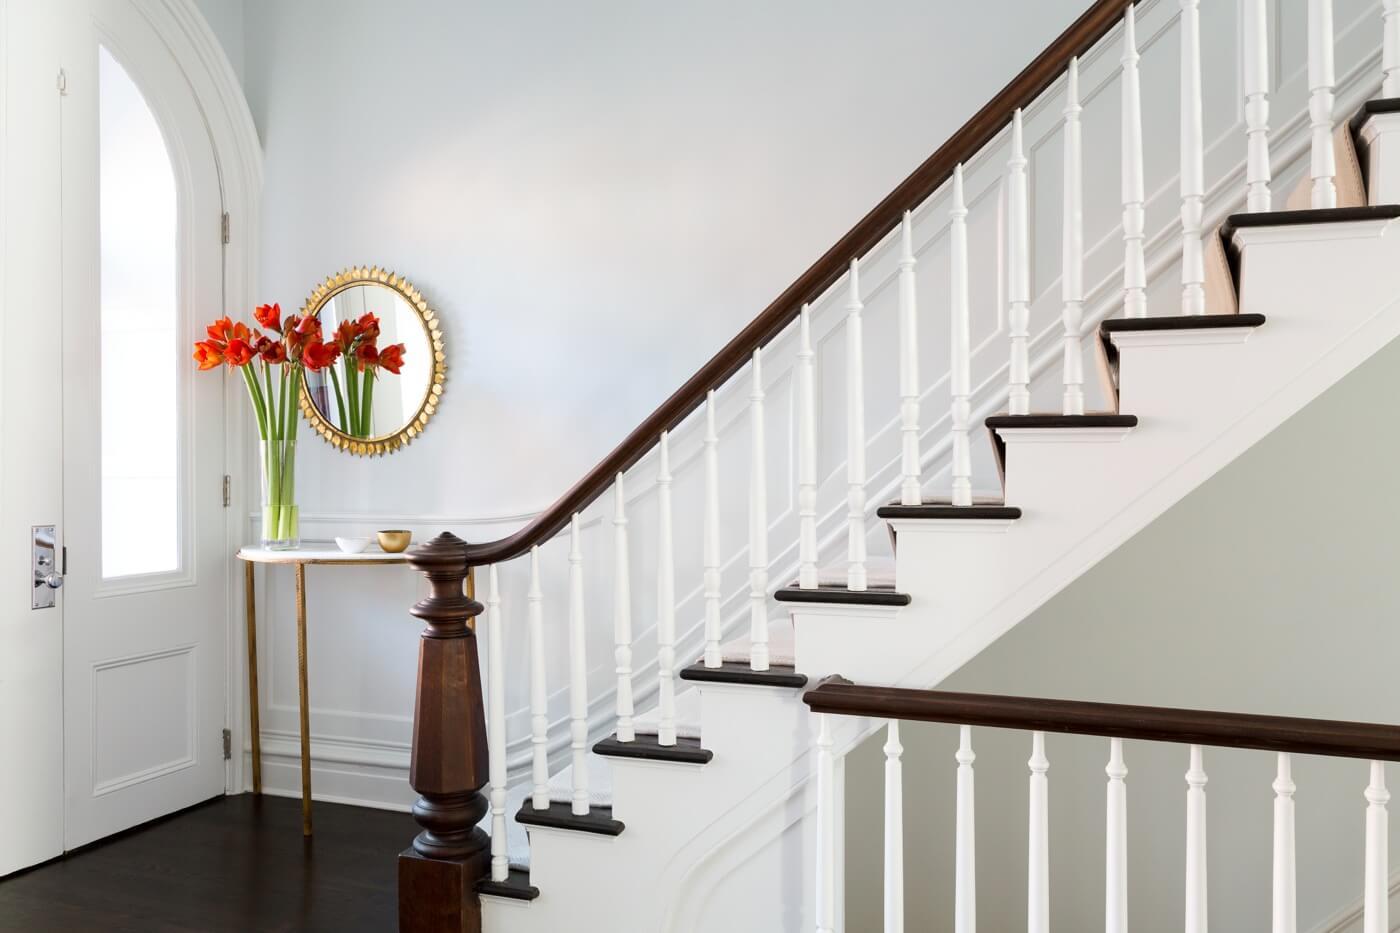 Молдинги в интерьере у лестницы